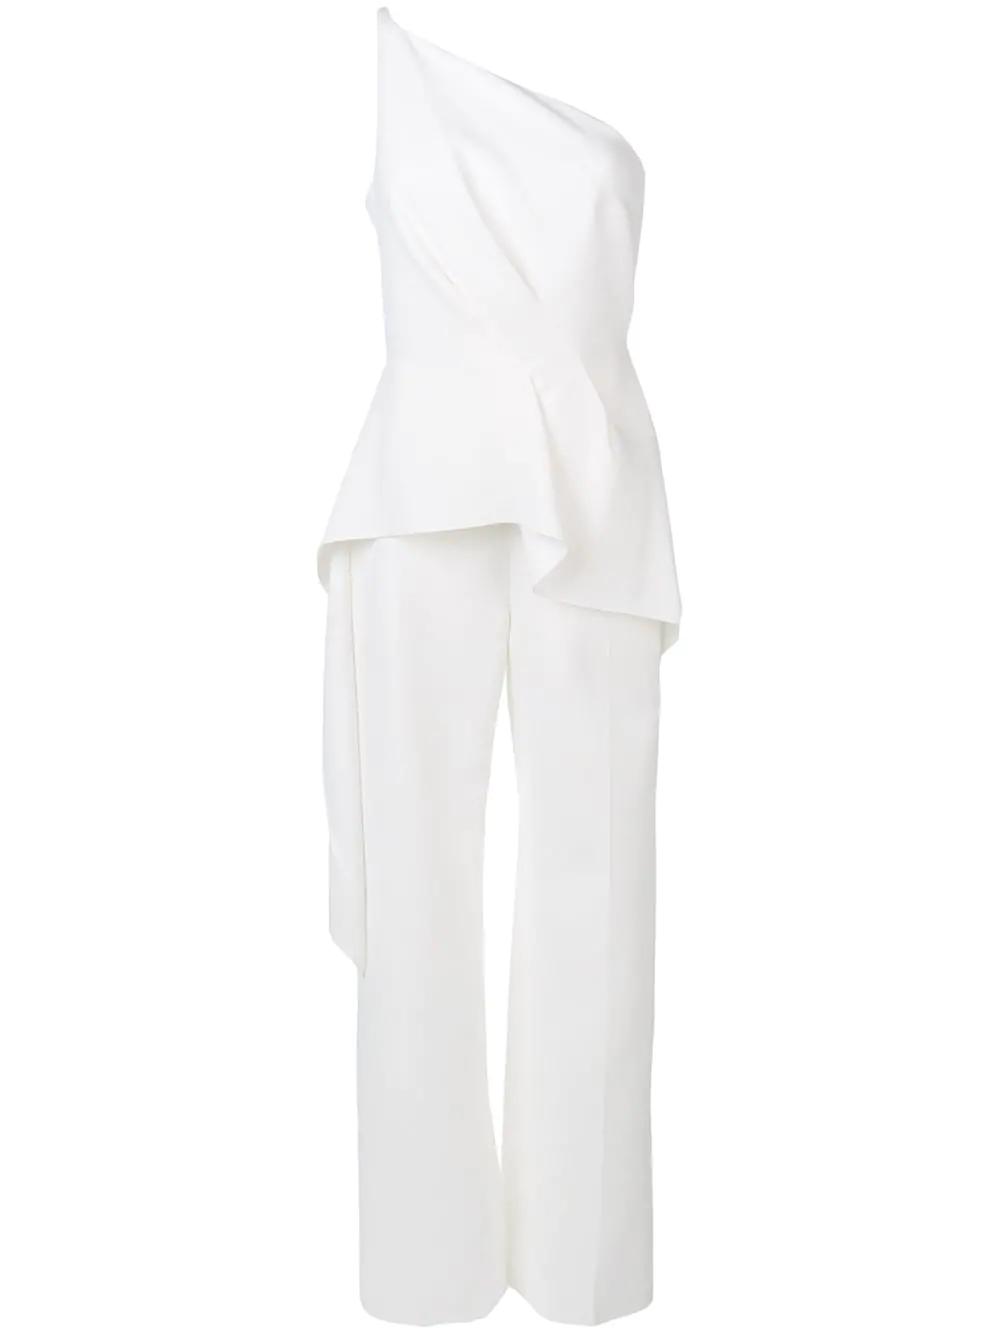 70b0df913f25 Roland Mouret Charlesworth One-Shoulder Draped Peplum Jumpsuit In White